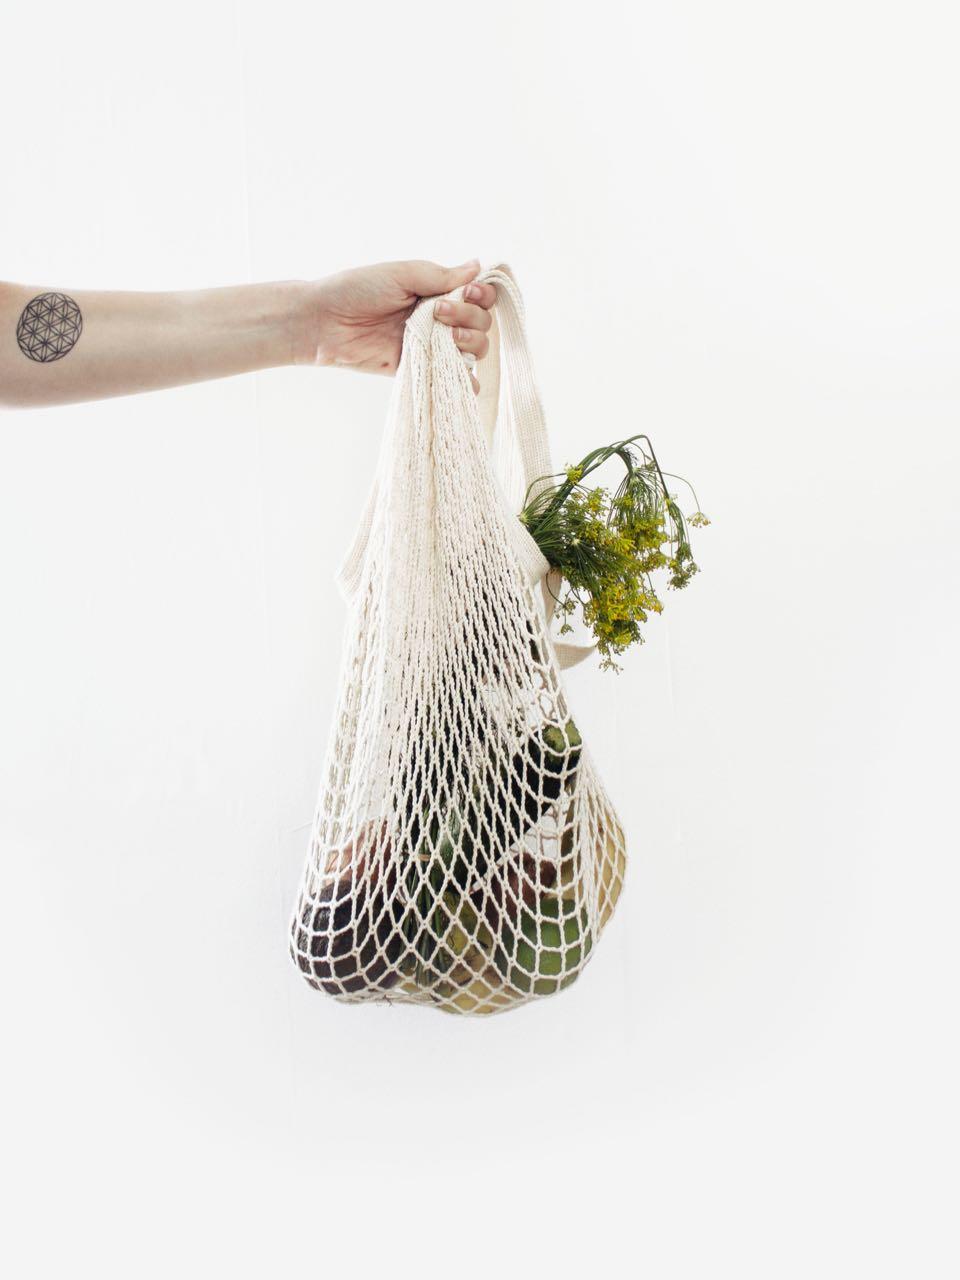 Foodsharing rettet Lebensmittel vor dem Müll